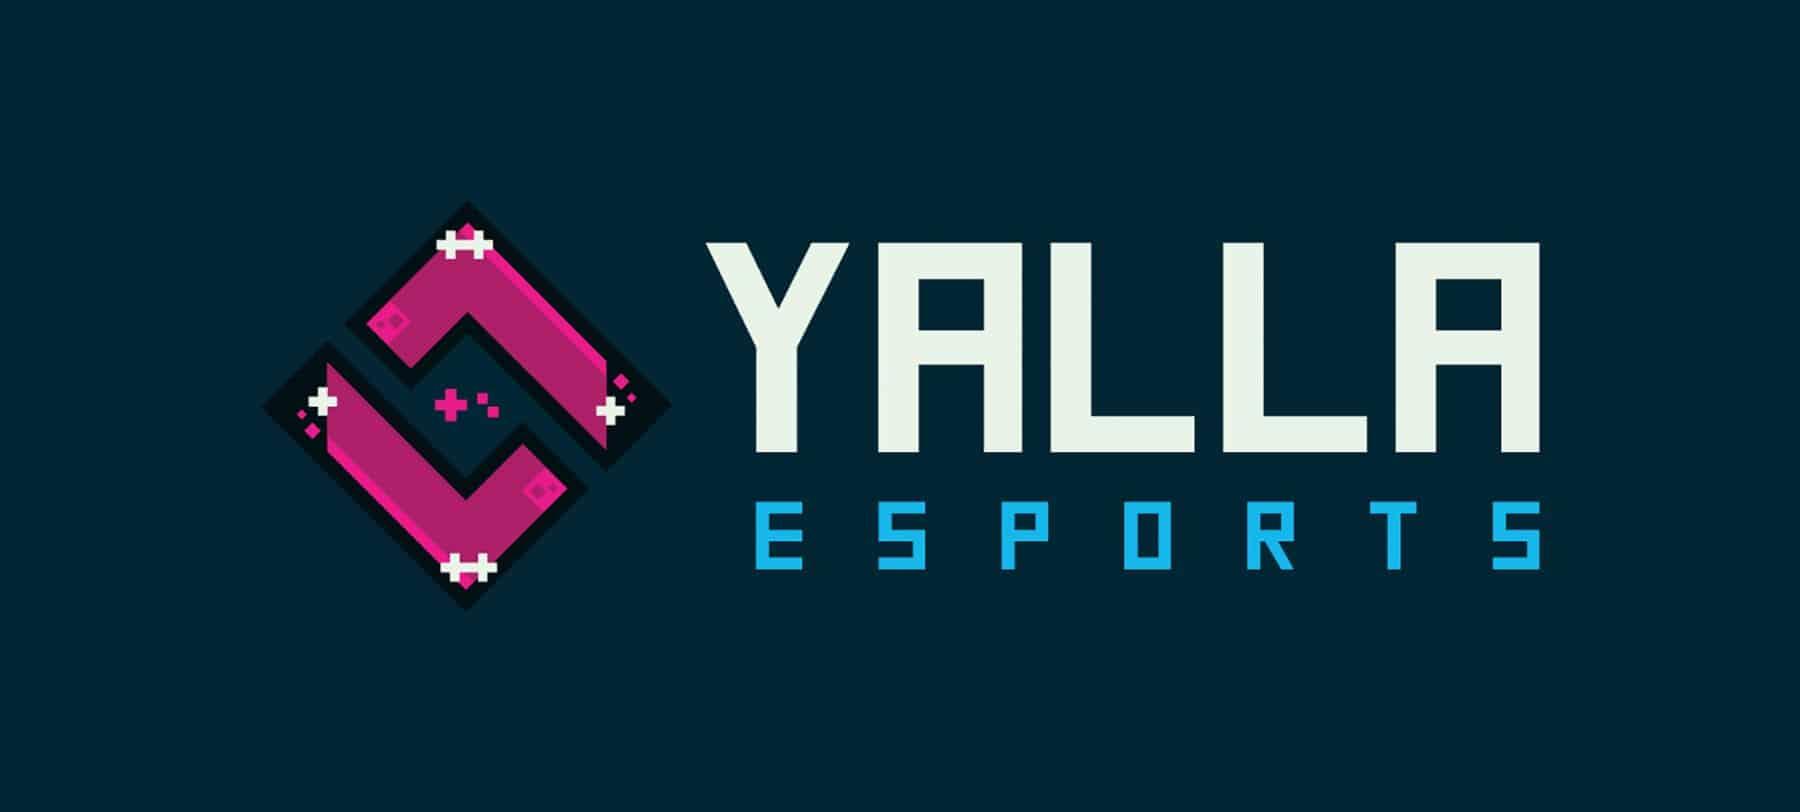 Photo of منظّمة Yalla eSports تبحث عن مدير لنادي المعجبين